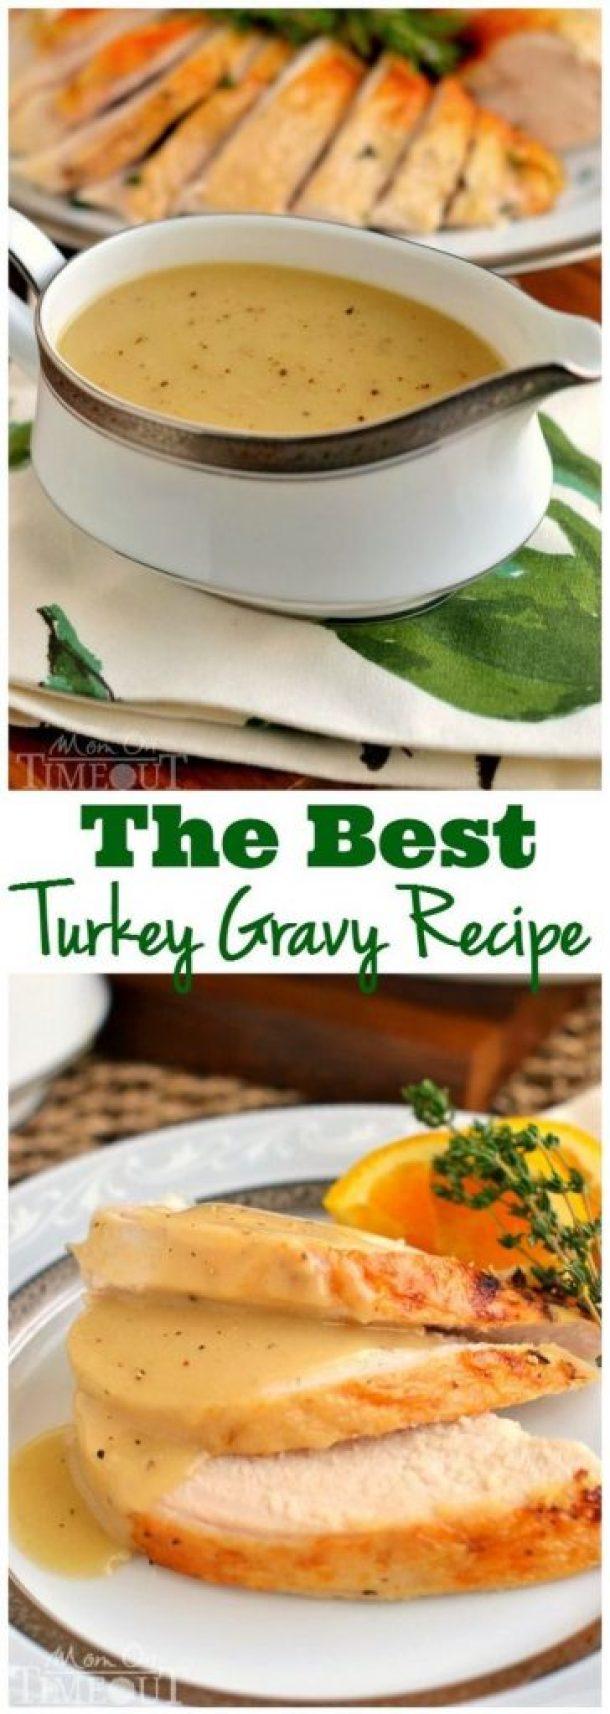 The Best Turkey Gravy Recipe | Mom On Timeout